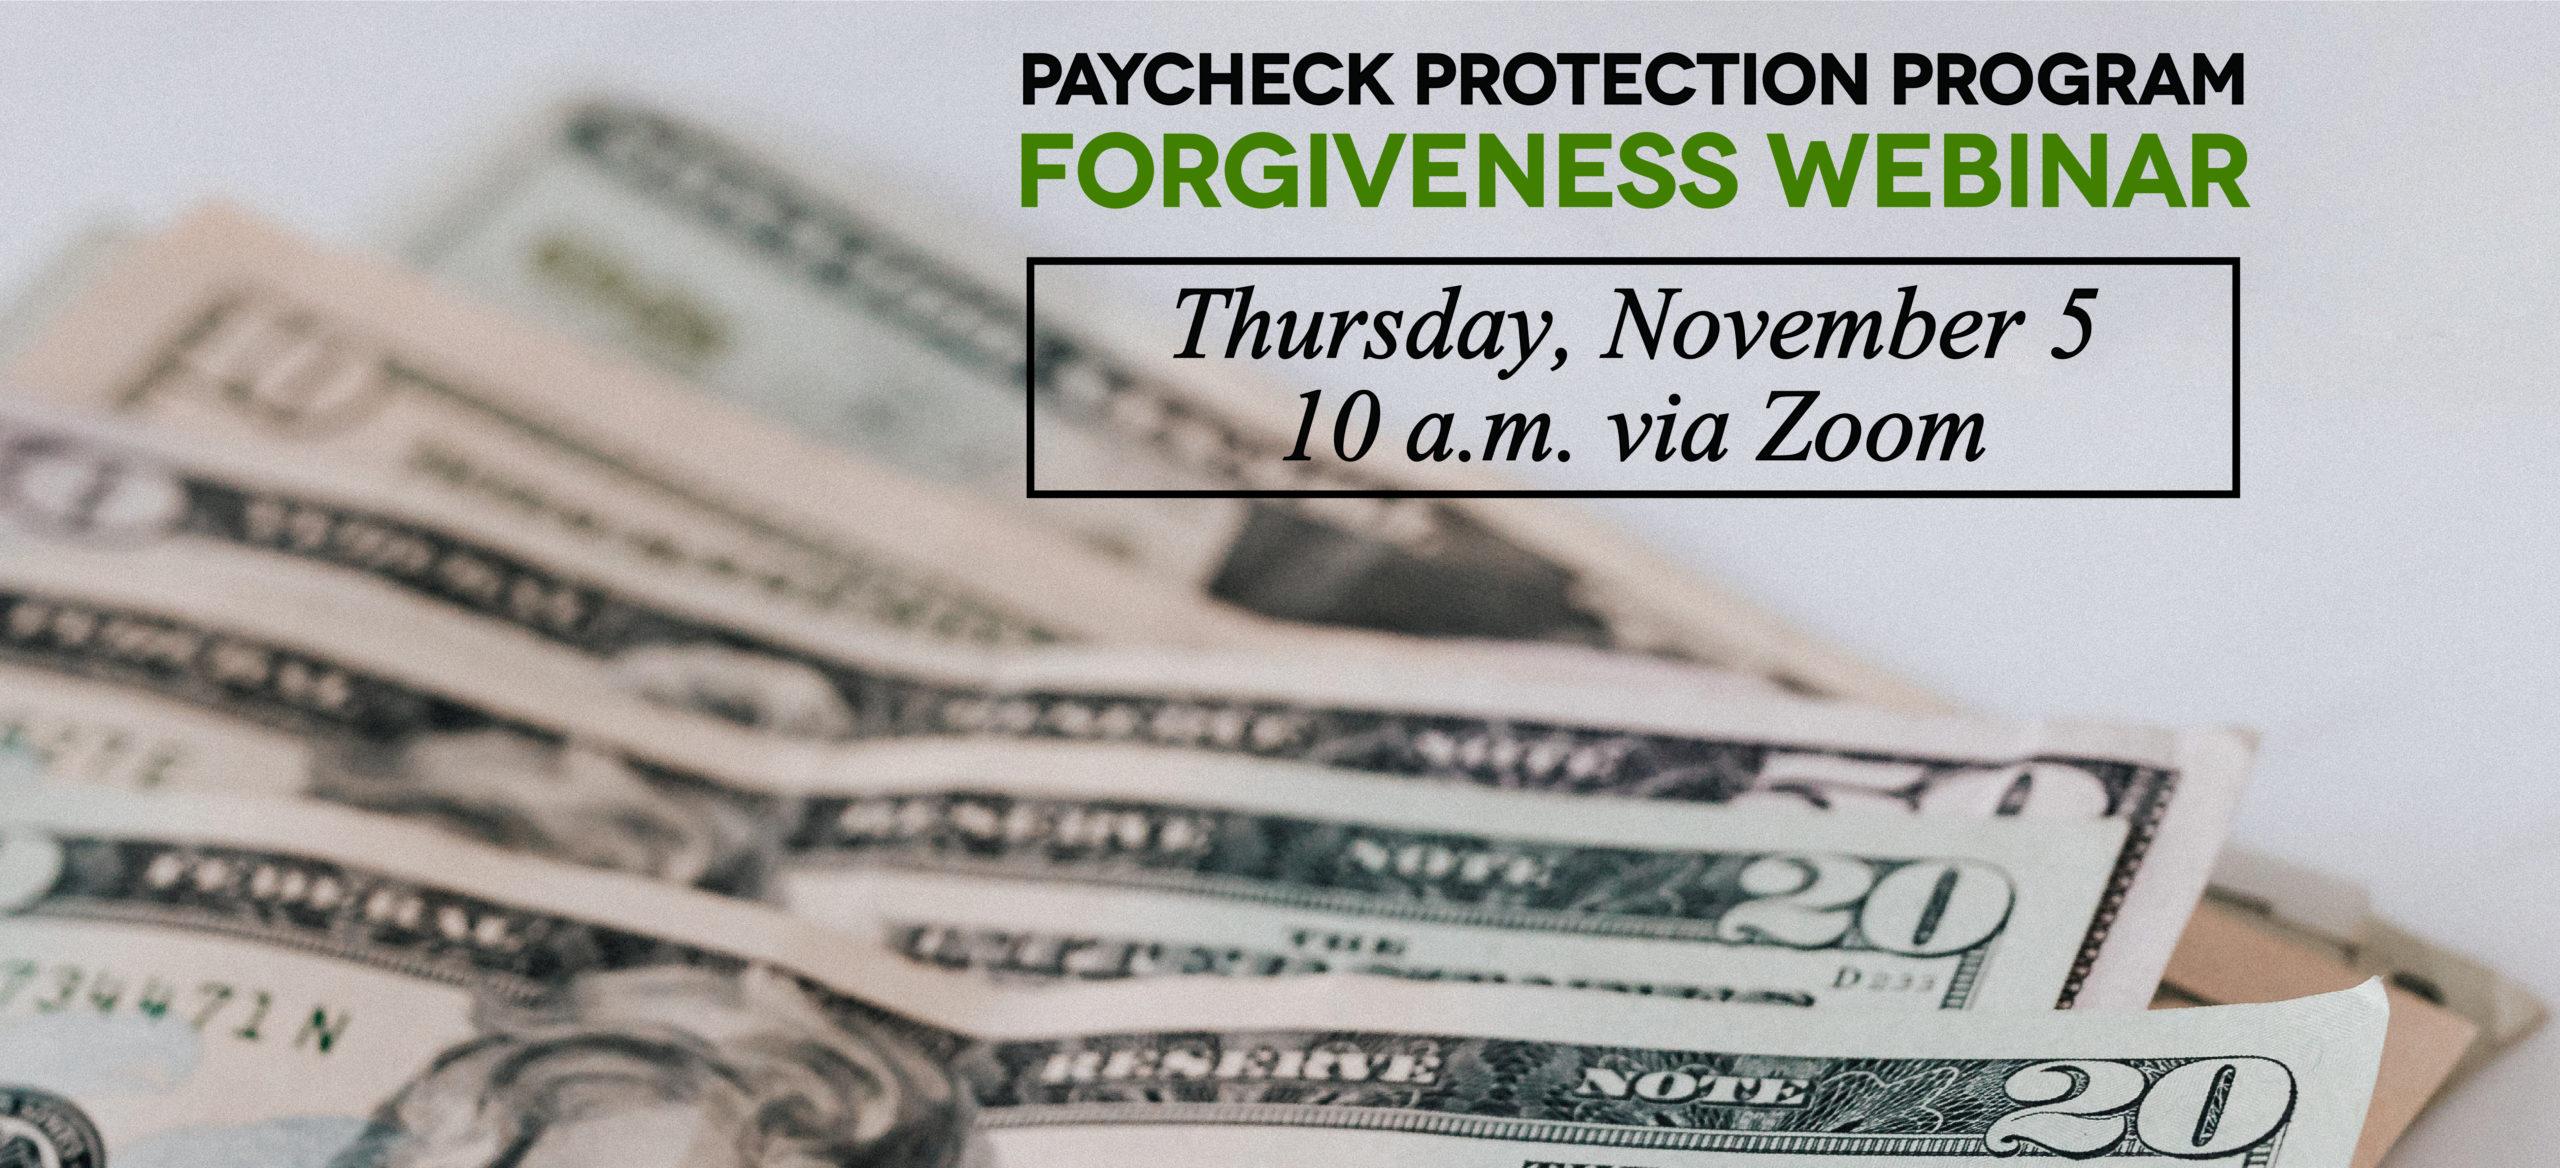 PPP Forgiveness Webinar